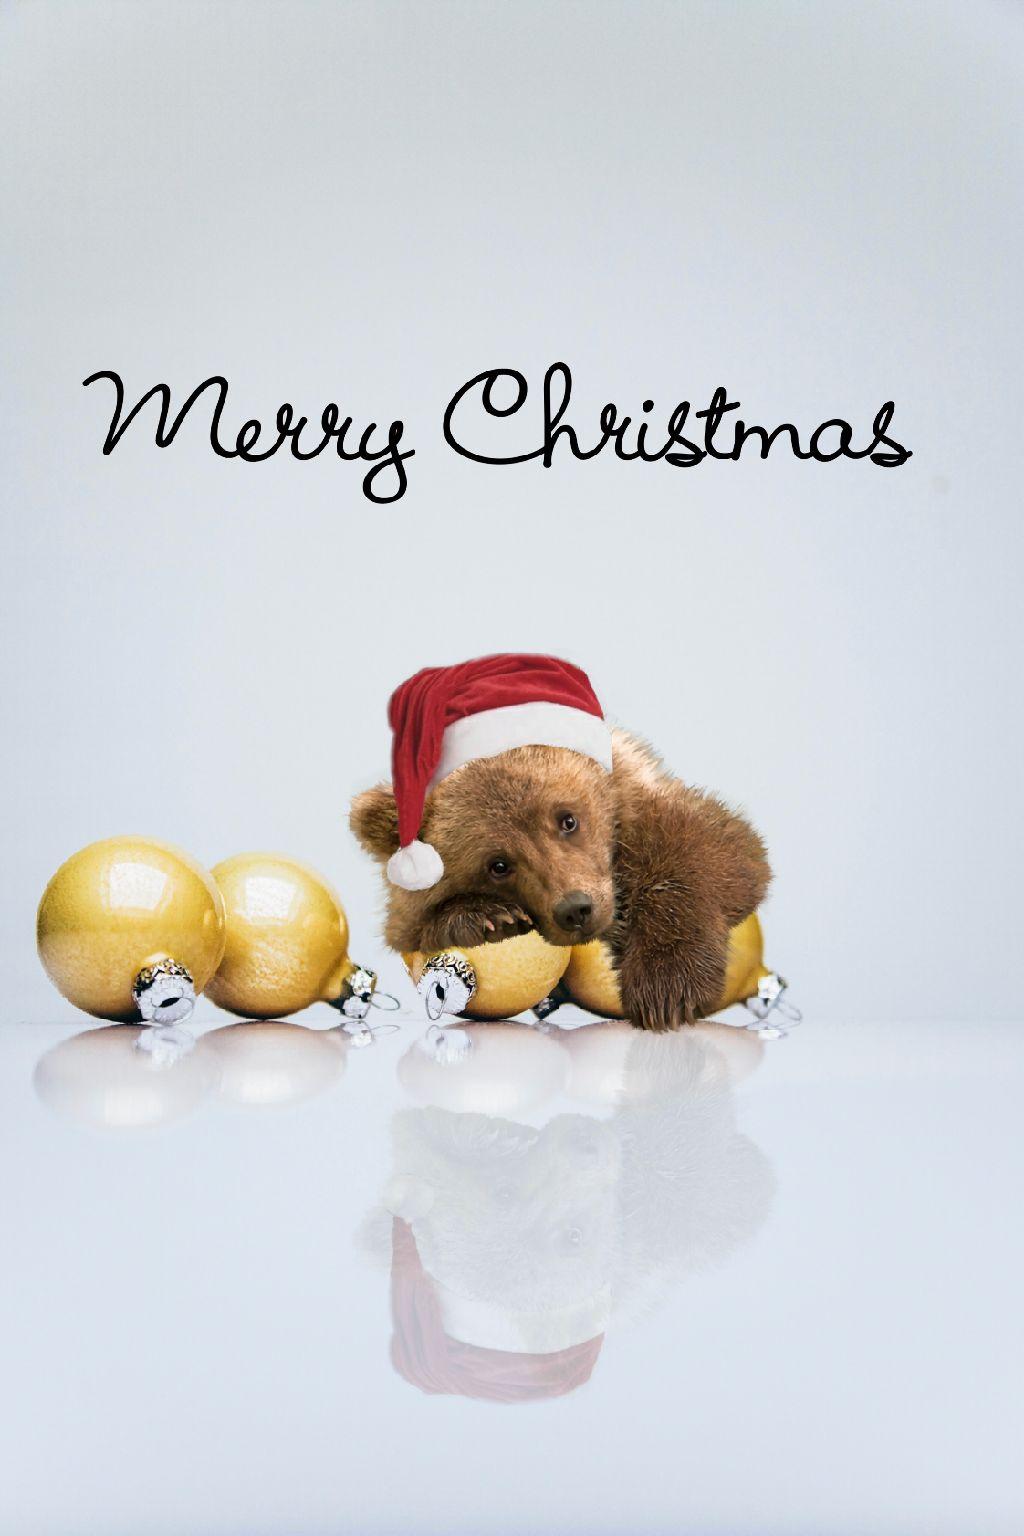 #freetoedit #merrychristmas #picsart #bear #christmas